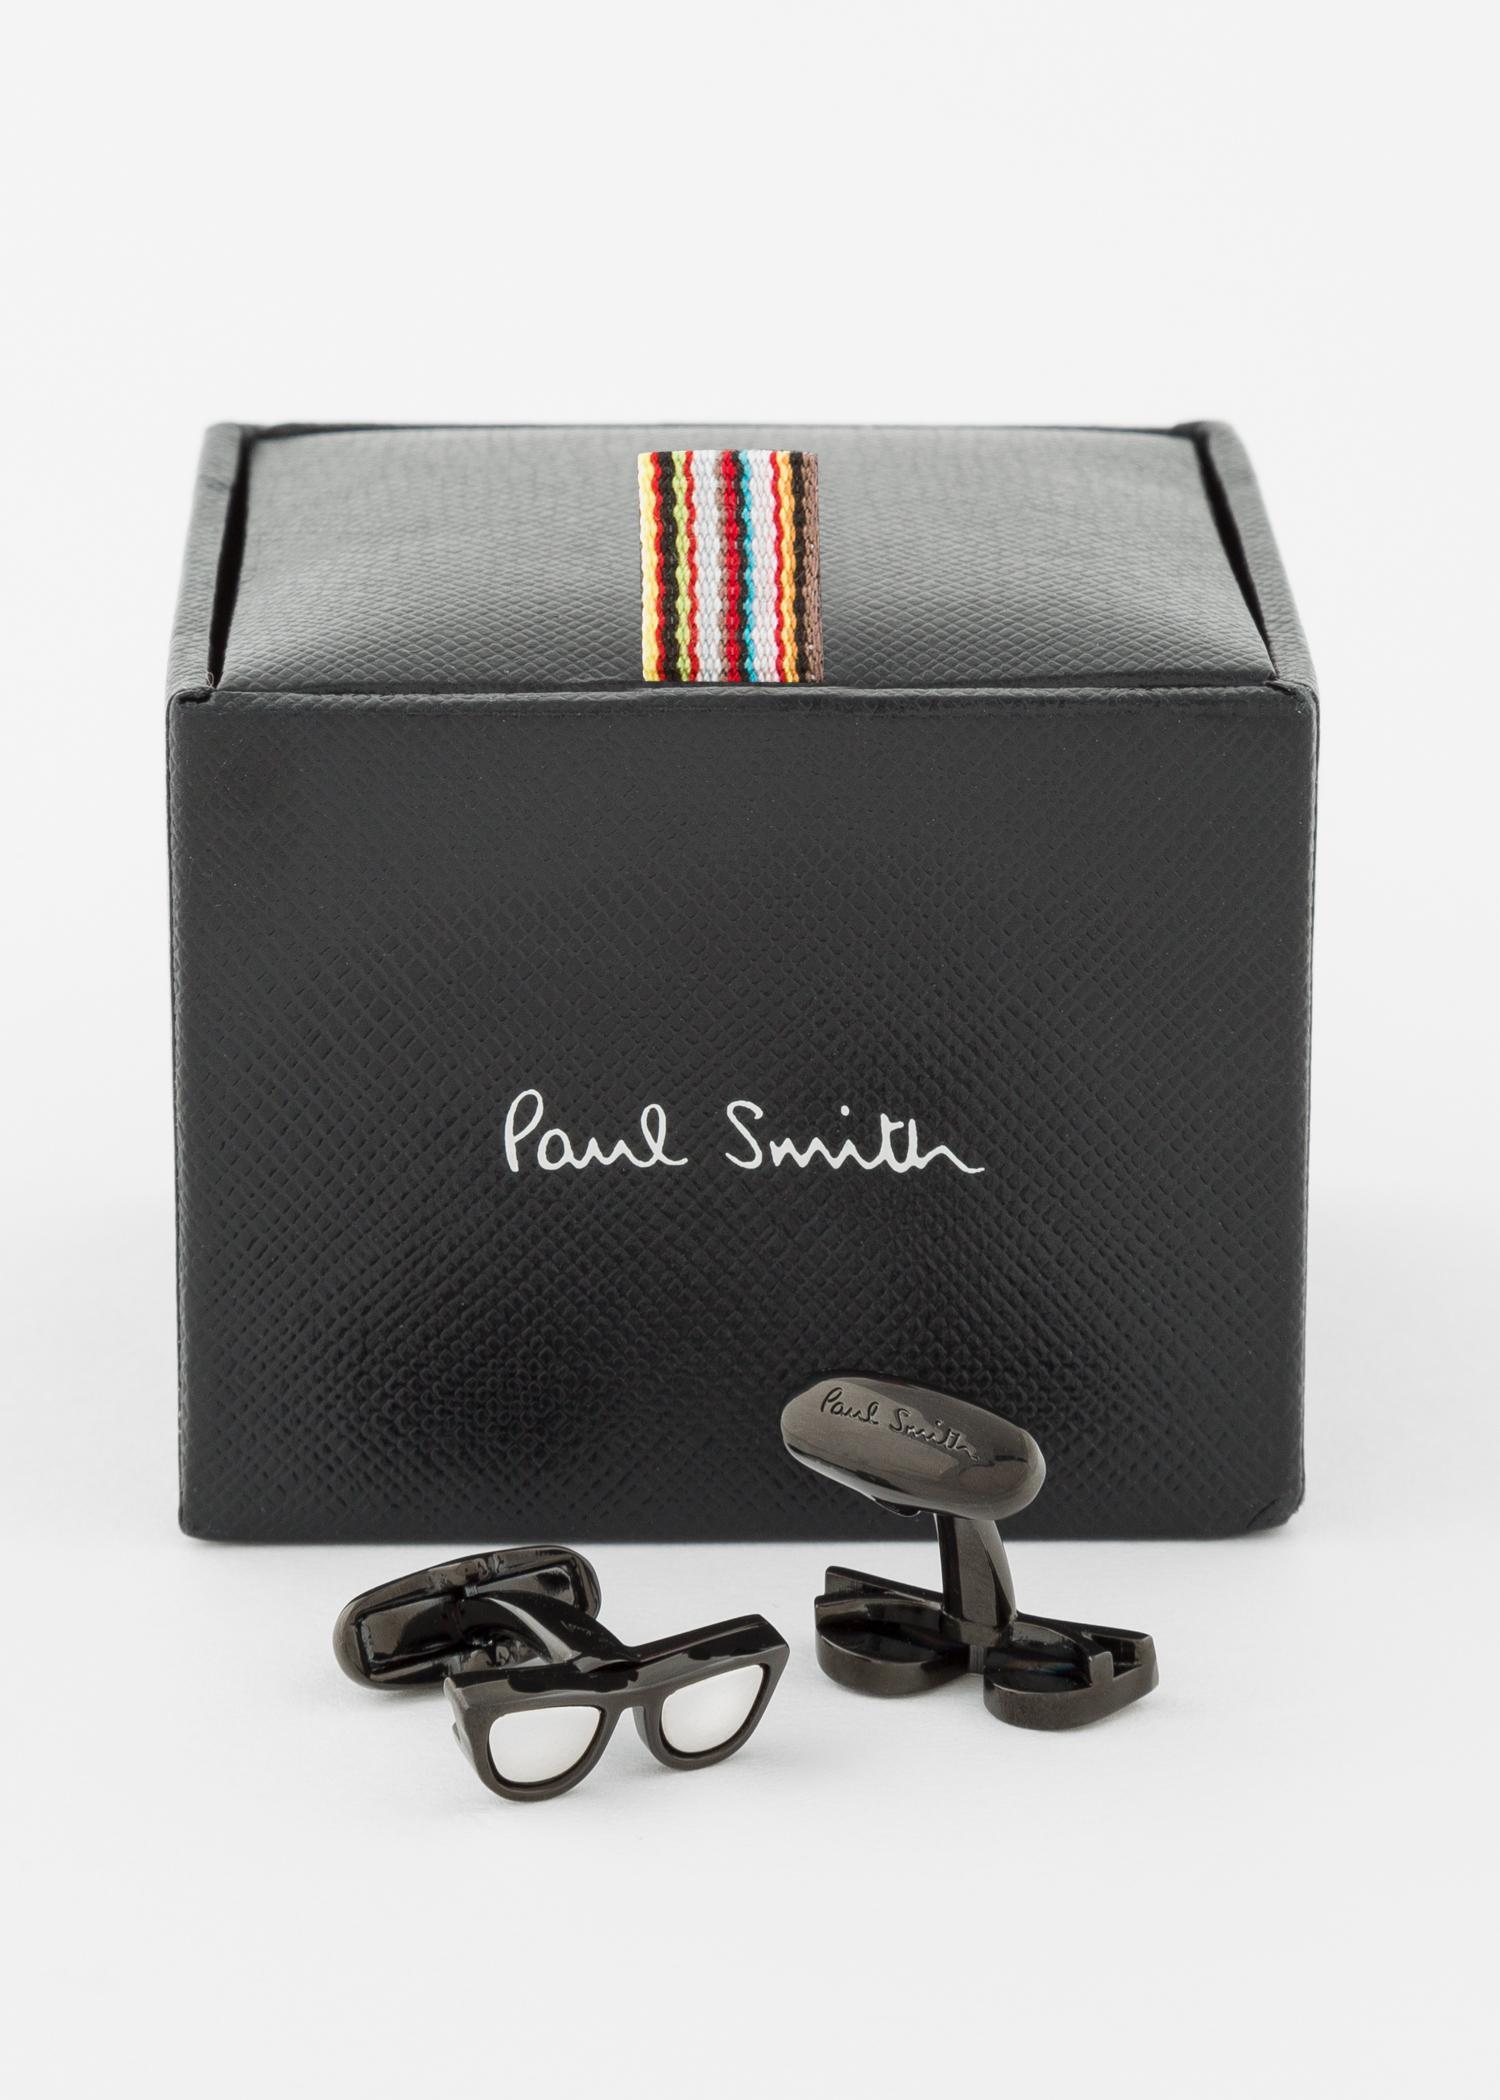 Paul Smith Black Sunglasses Cufflinks for Men